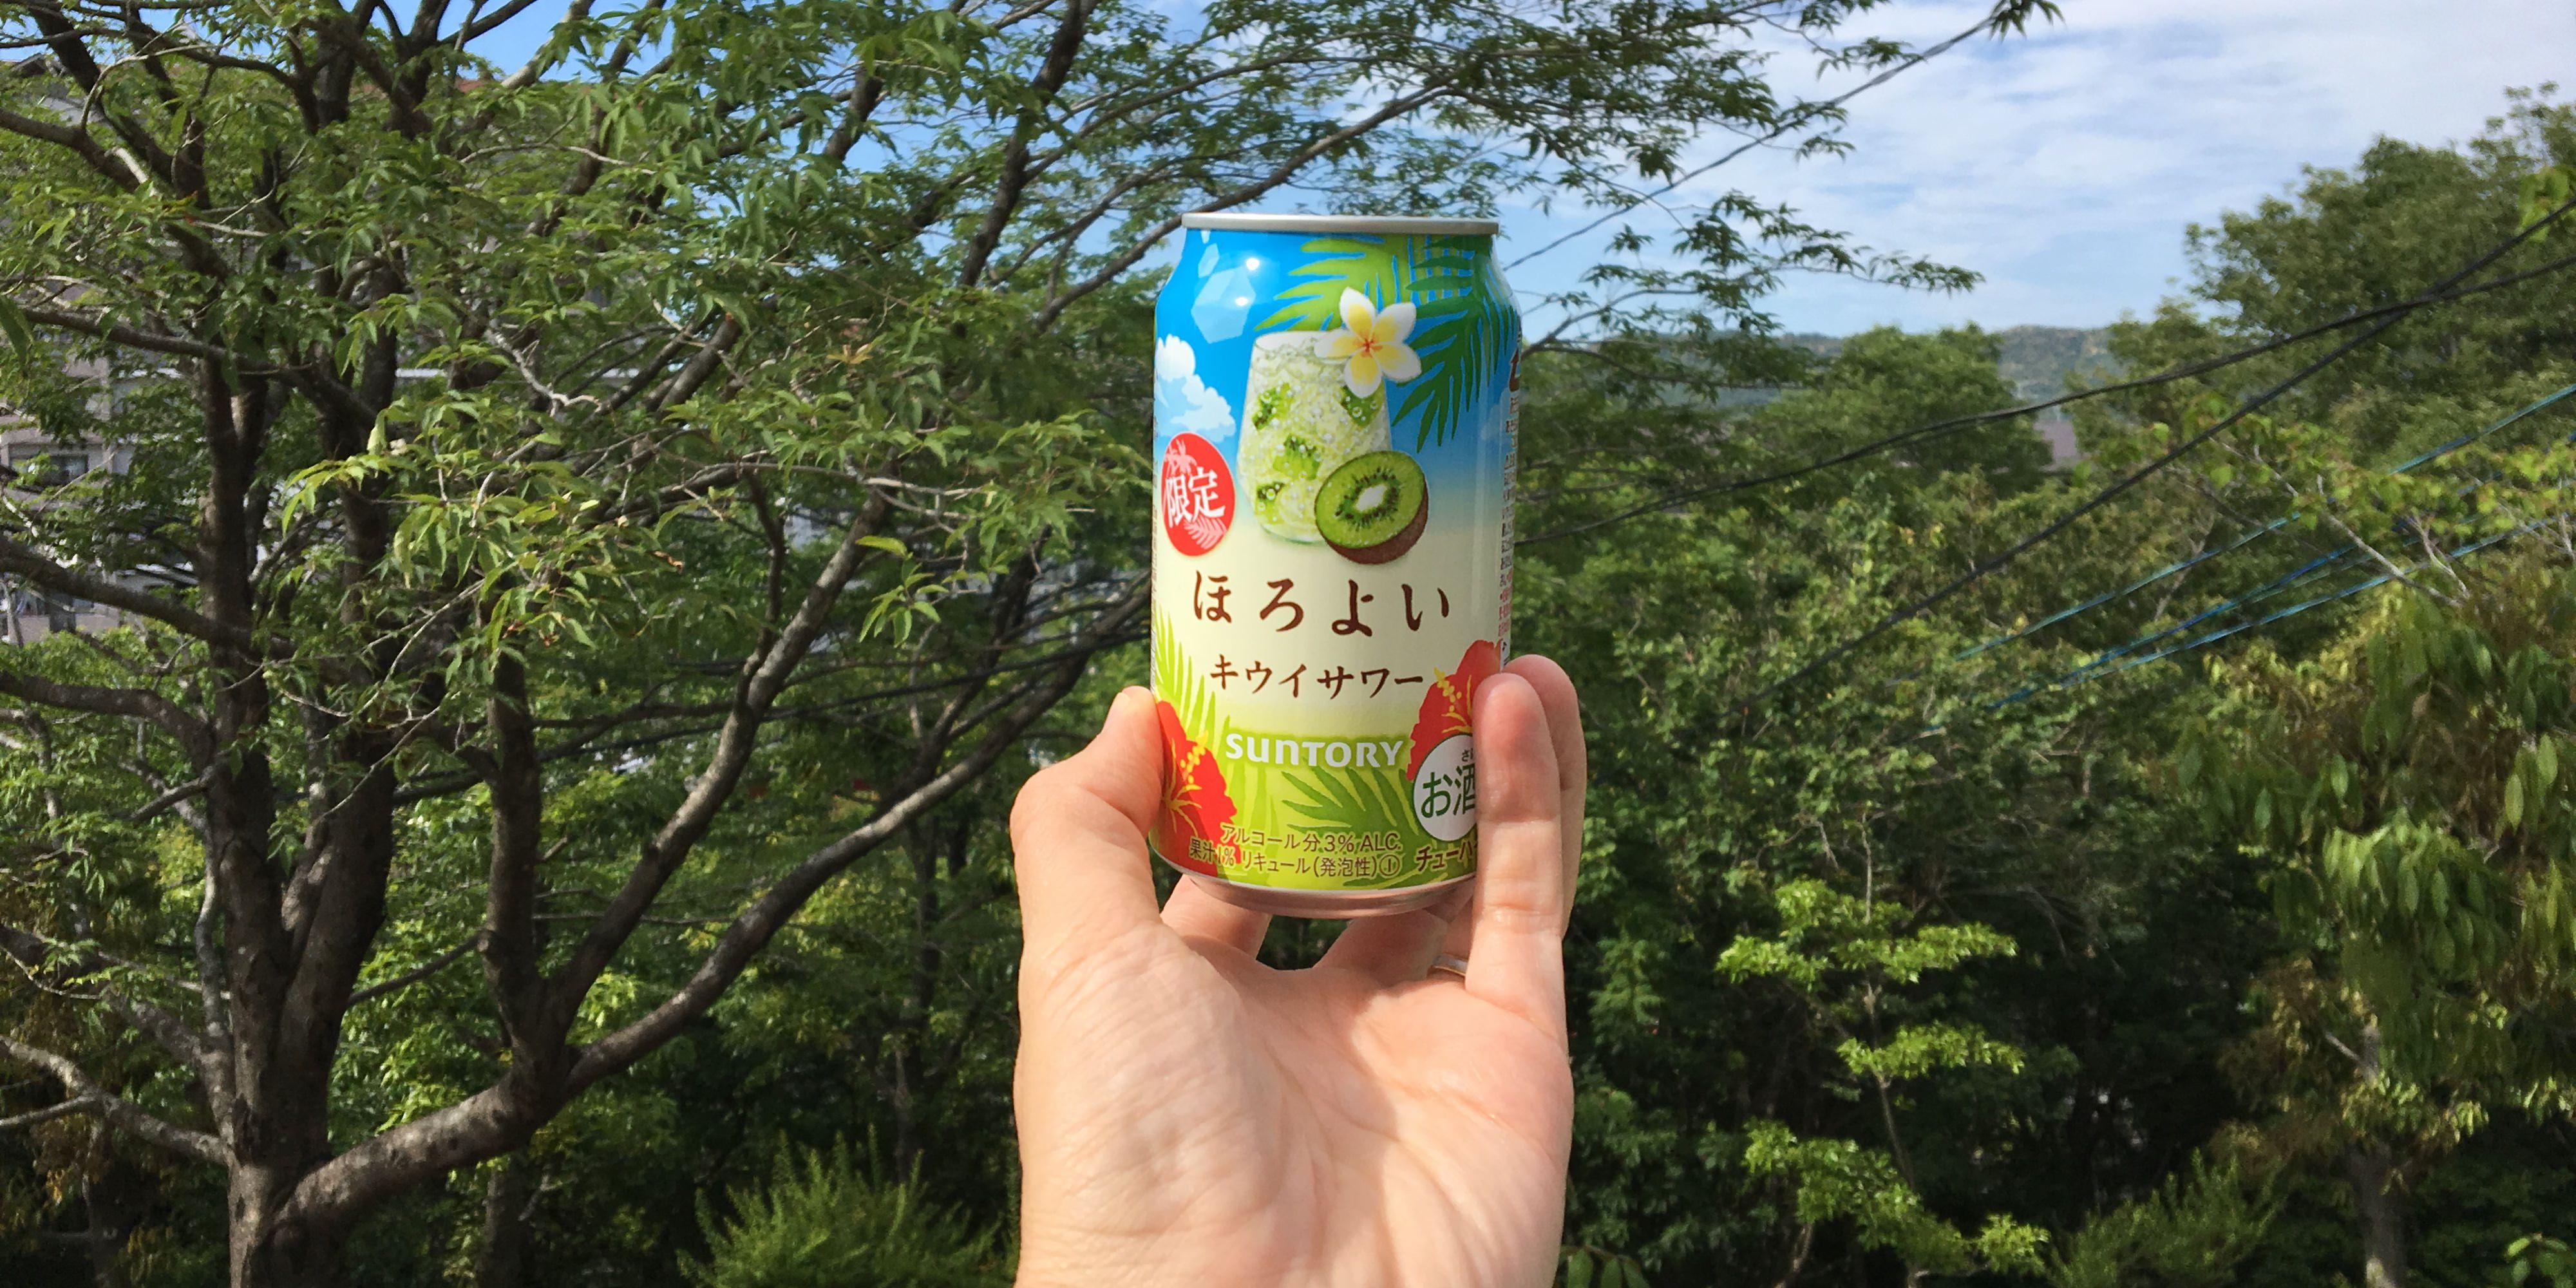 Suntory Kiwi Sour